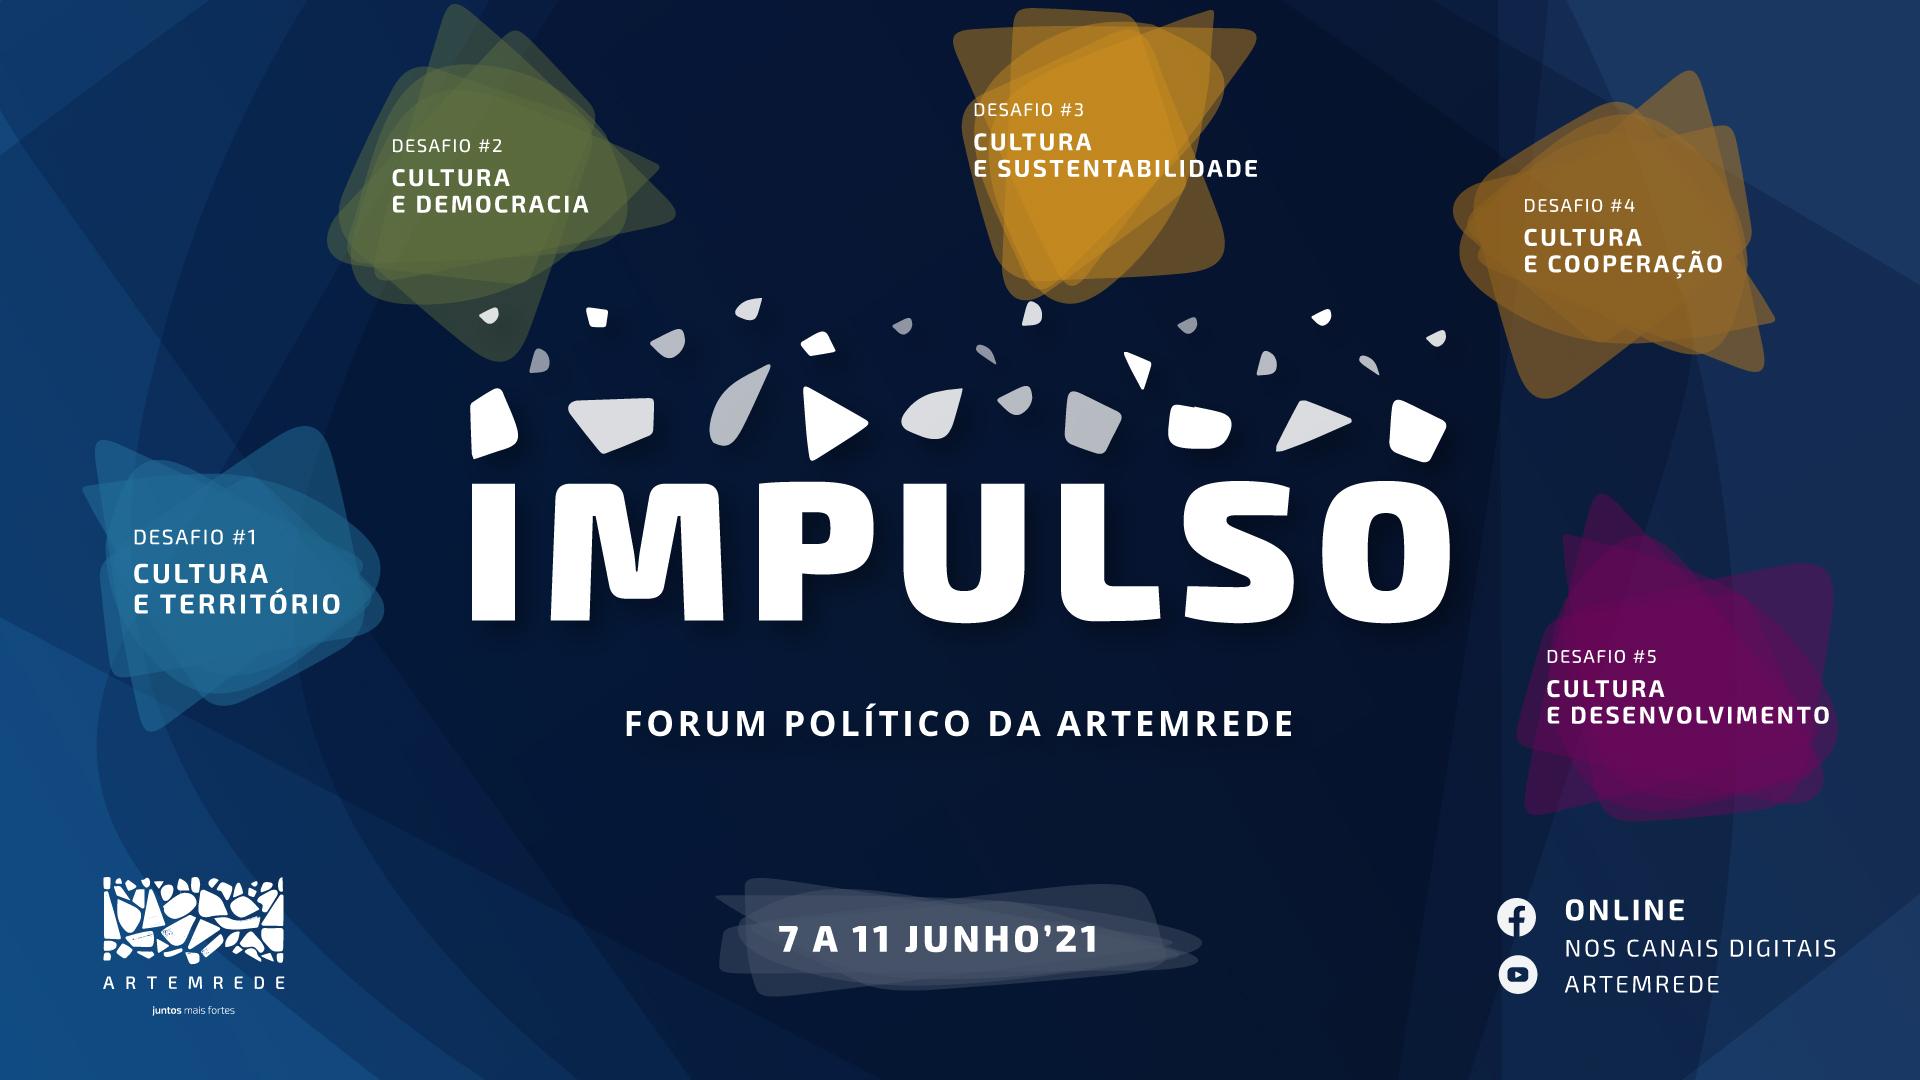 impulso21_desafios